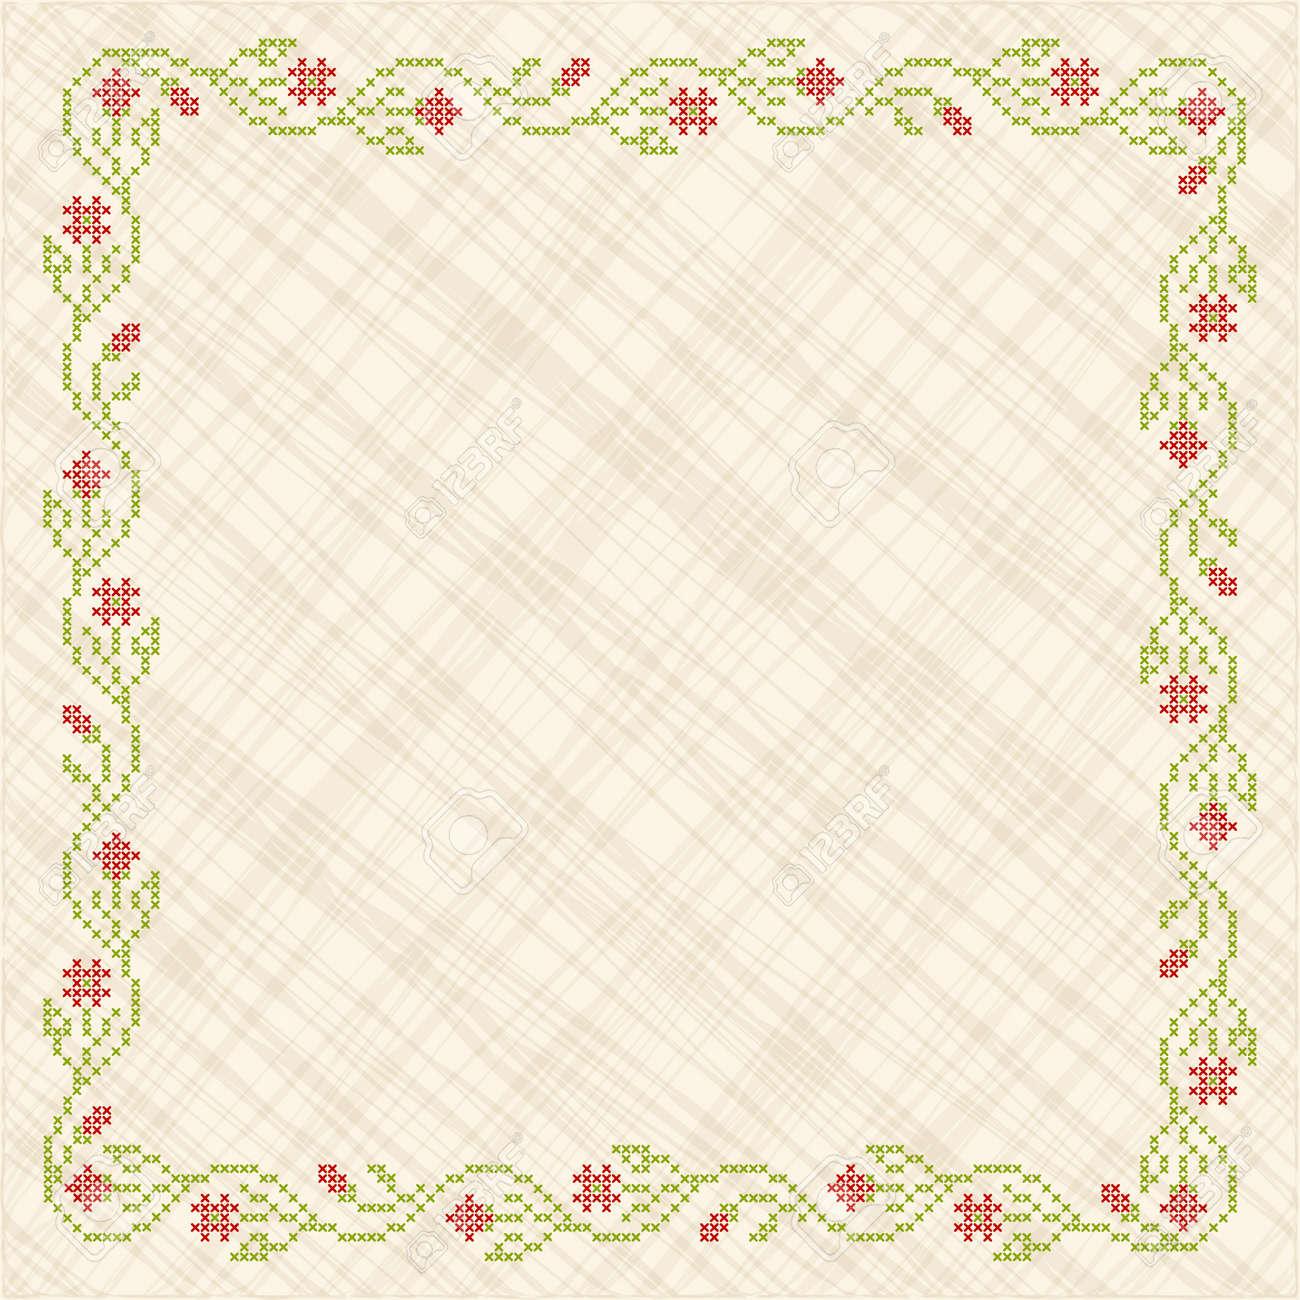 Illustration Of Cross Stitch Embroidery Floral Frame Design Elements